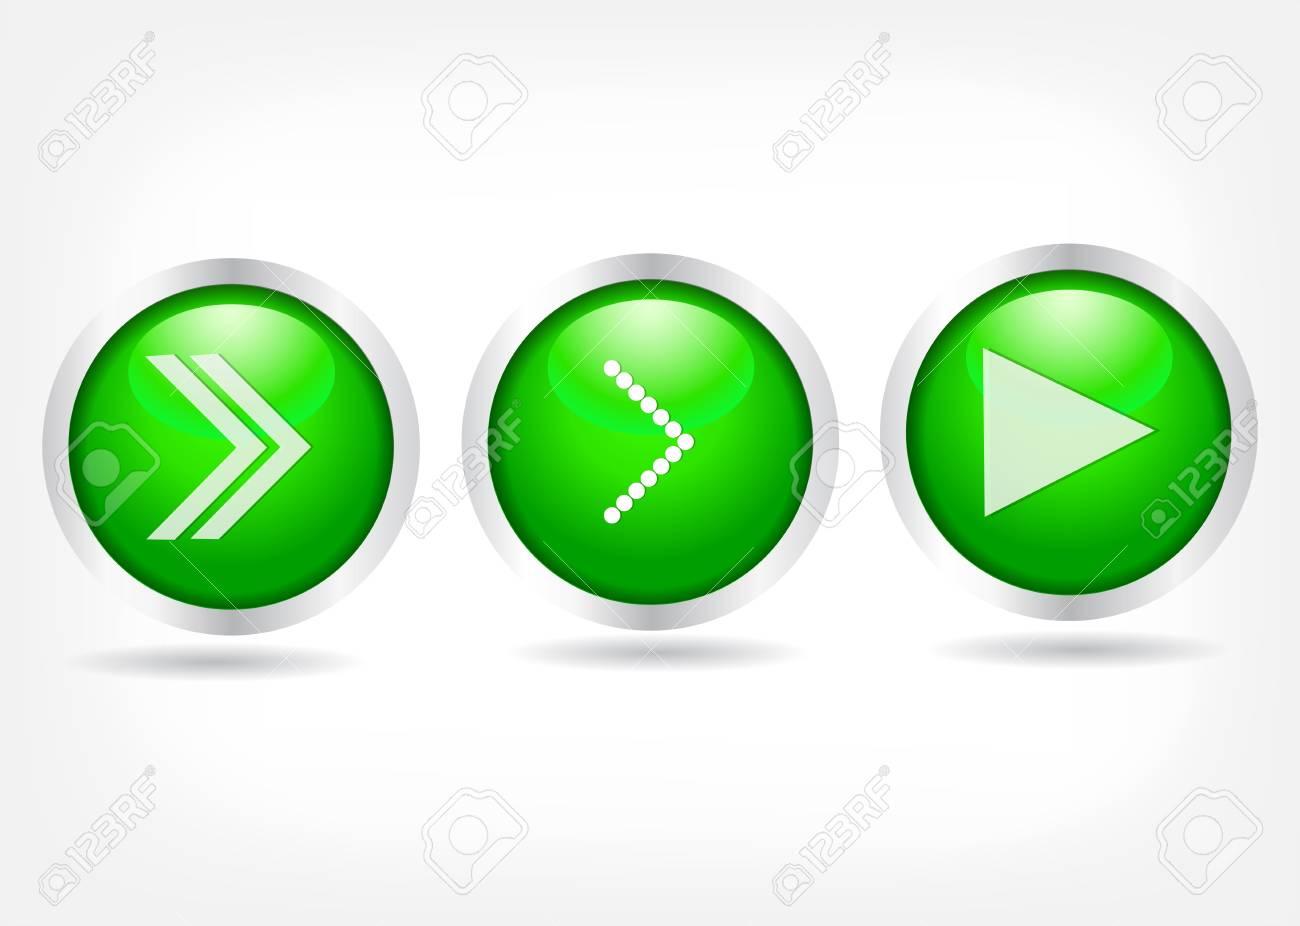 Green buttons with arrows. Vector Eps 10 Stock Vector - 18410963